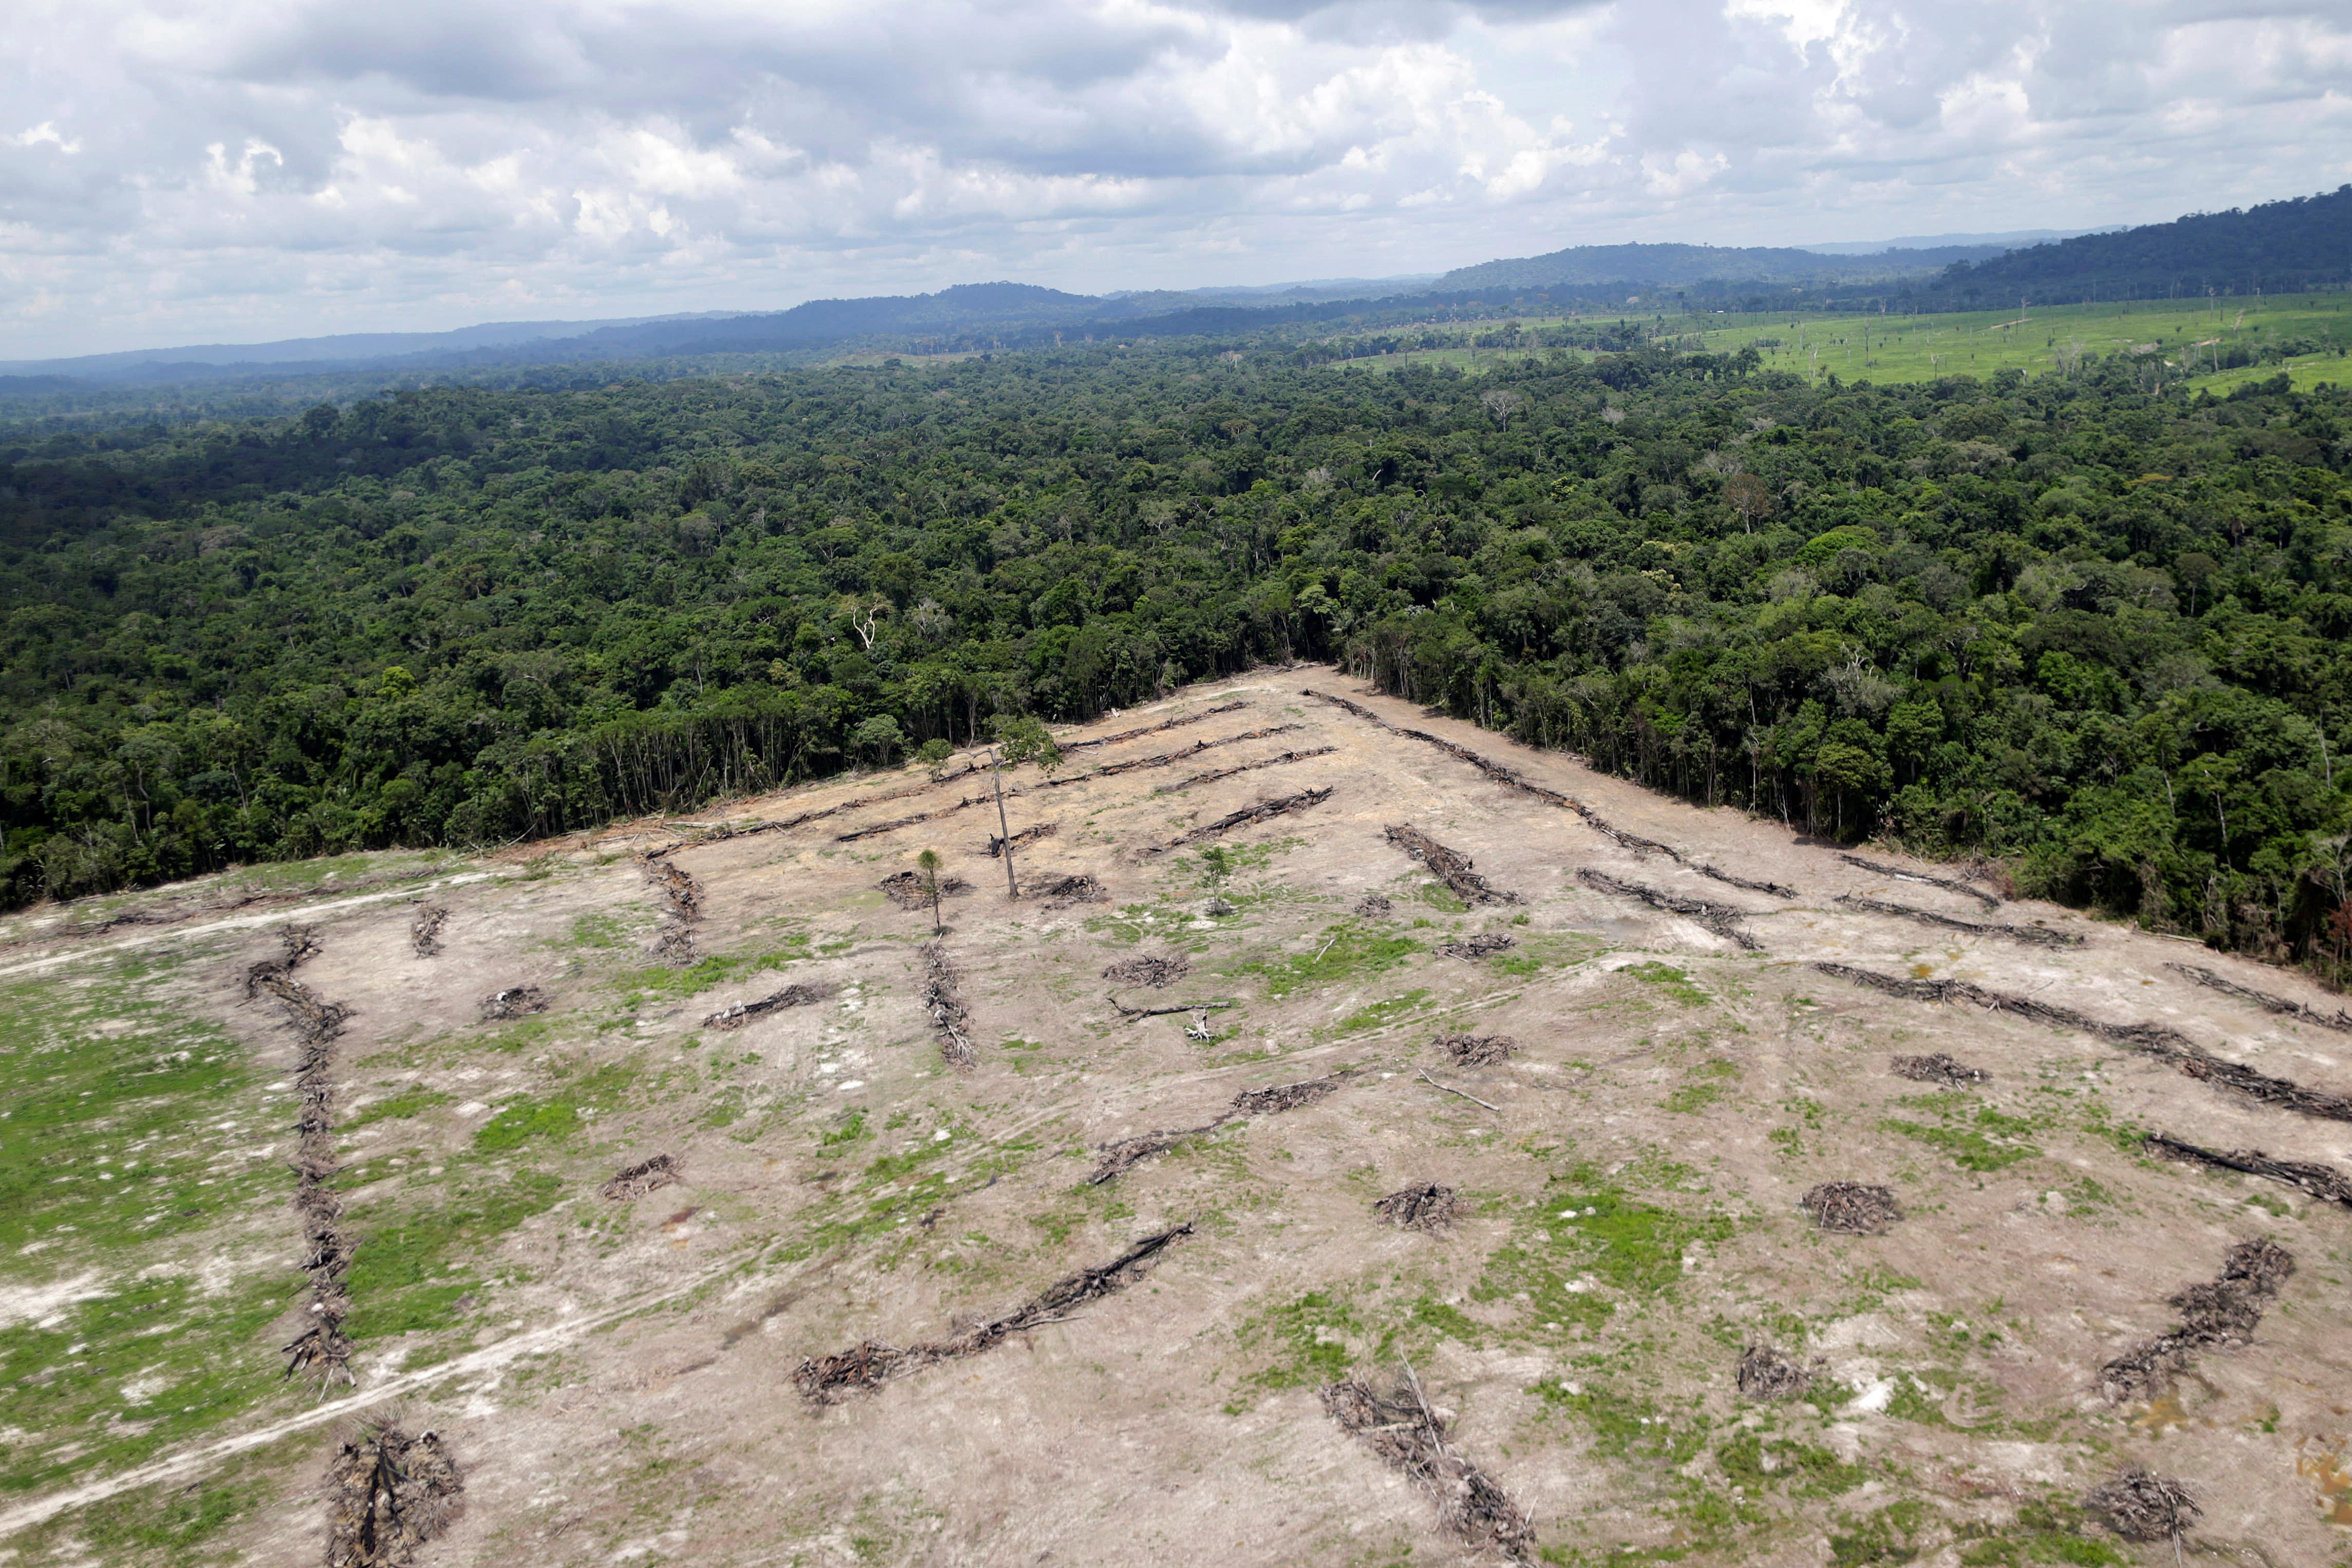 Desmatamento, Amazônia